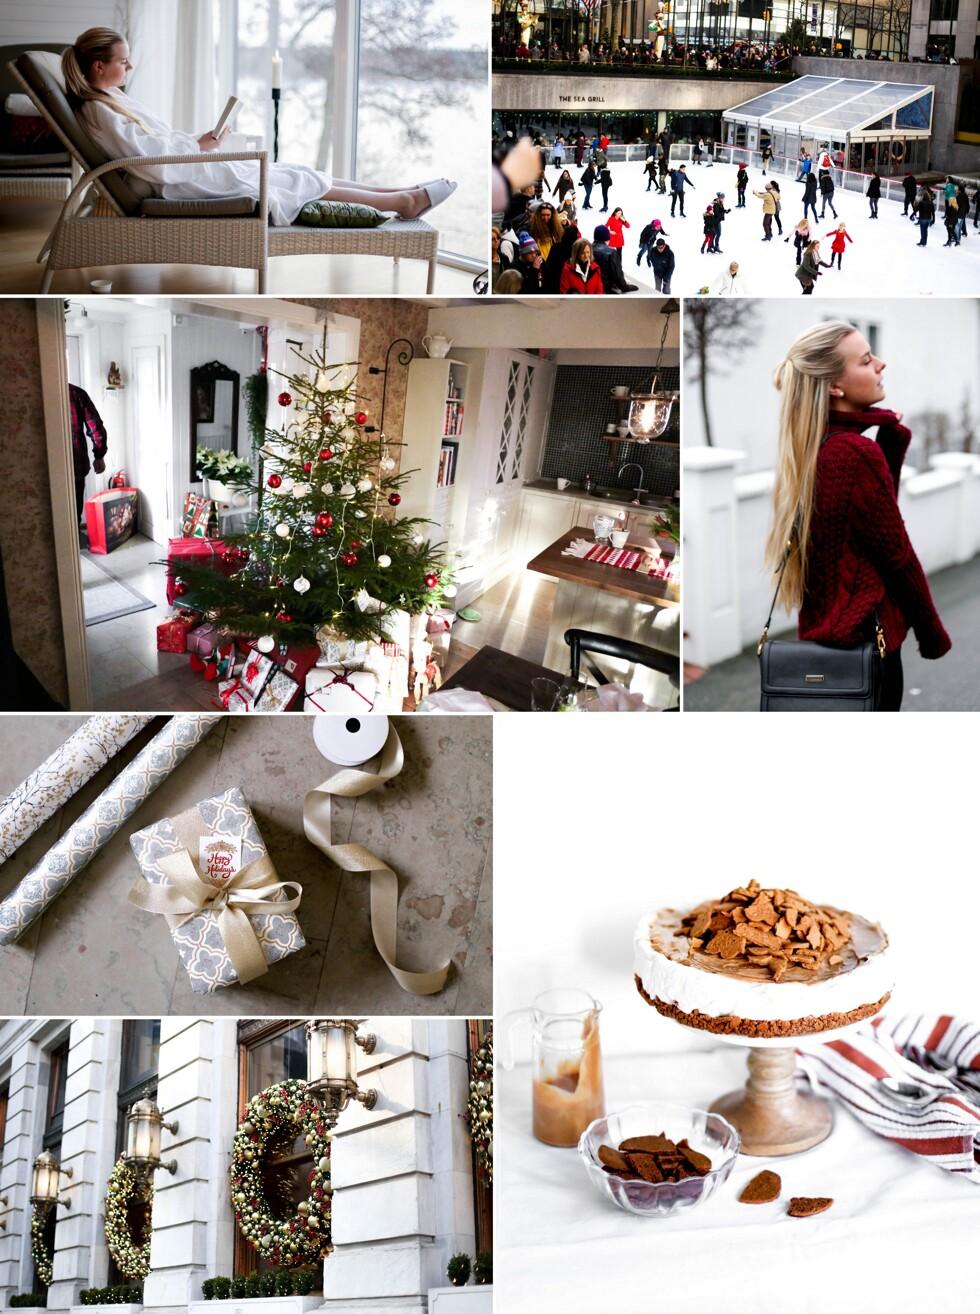 Sverige Julen 20154